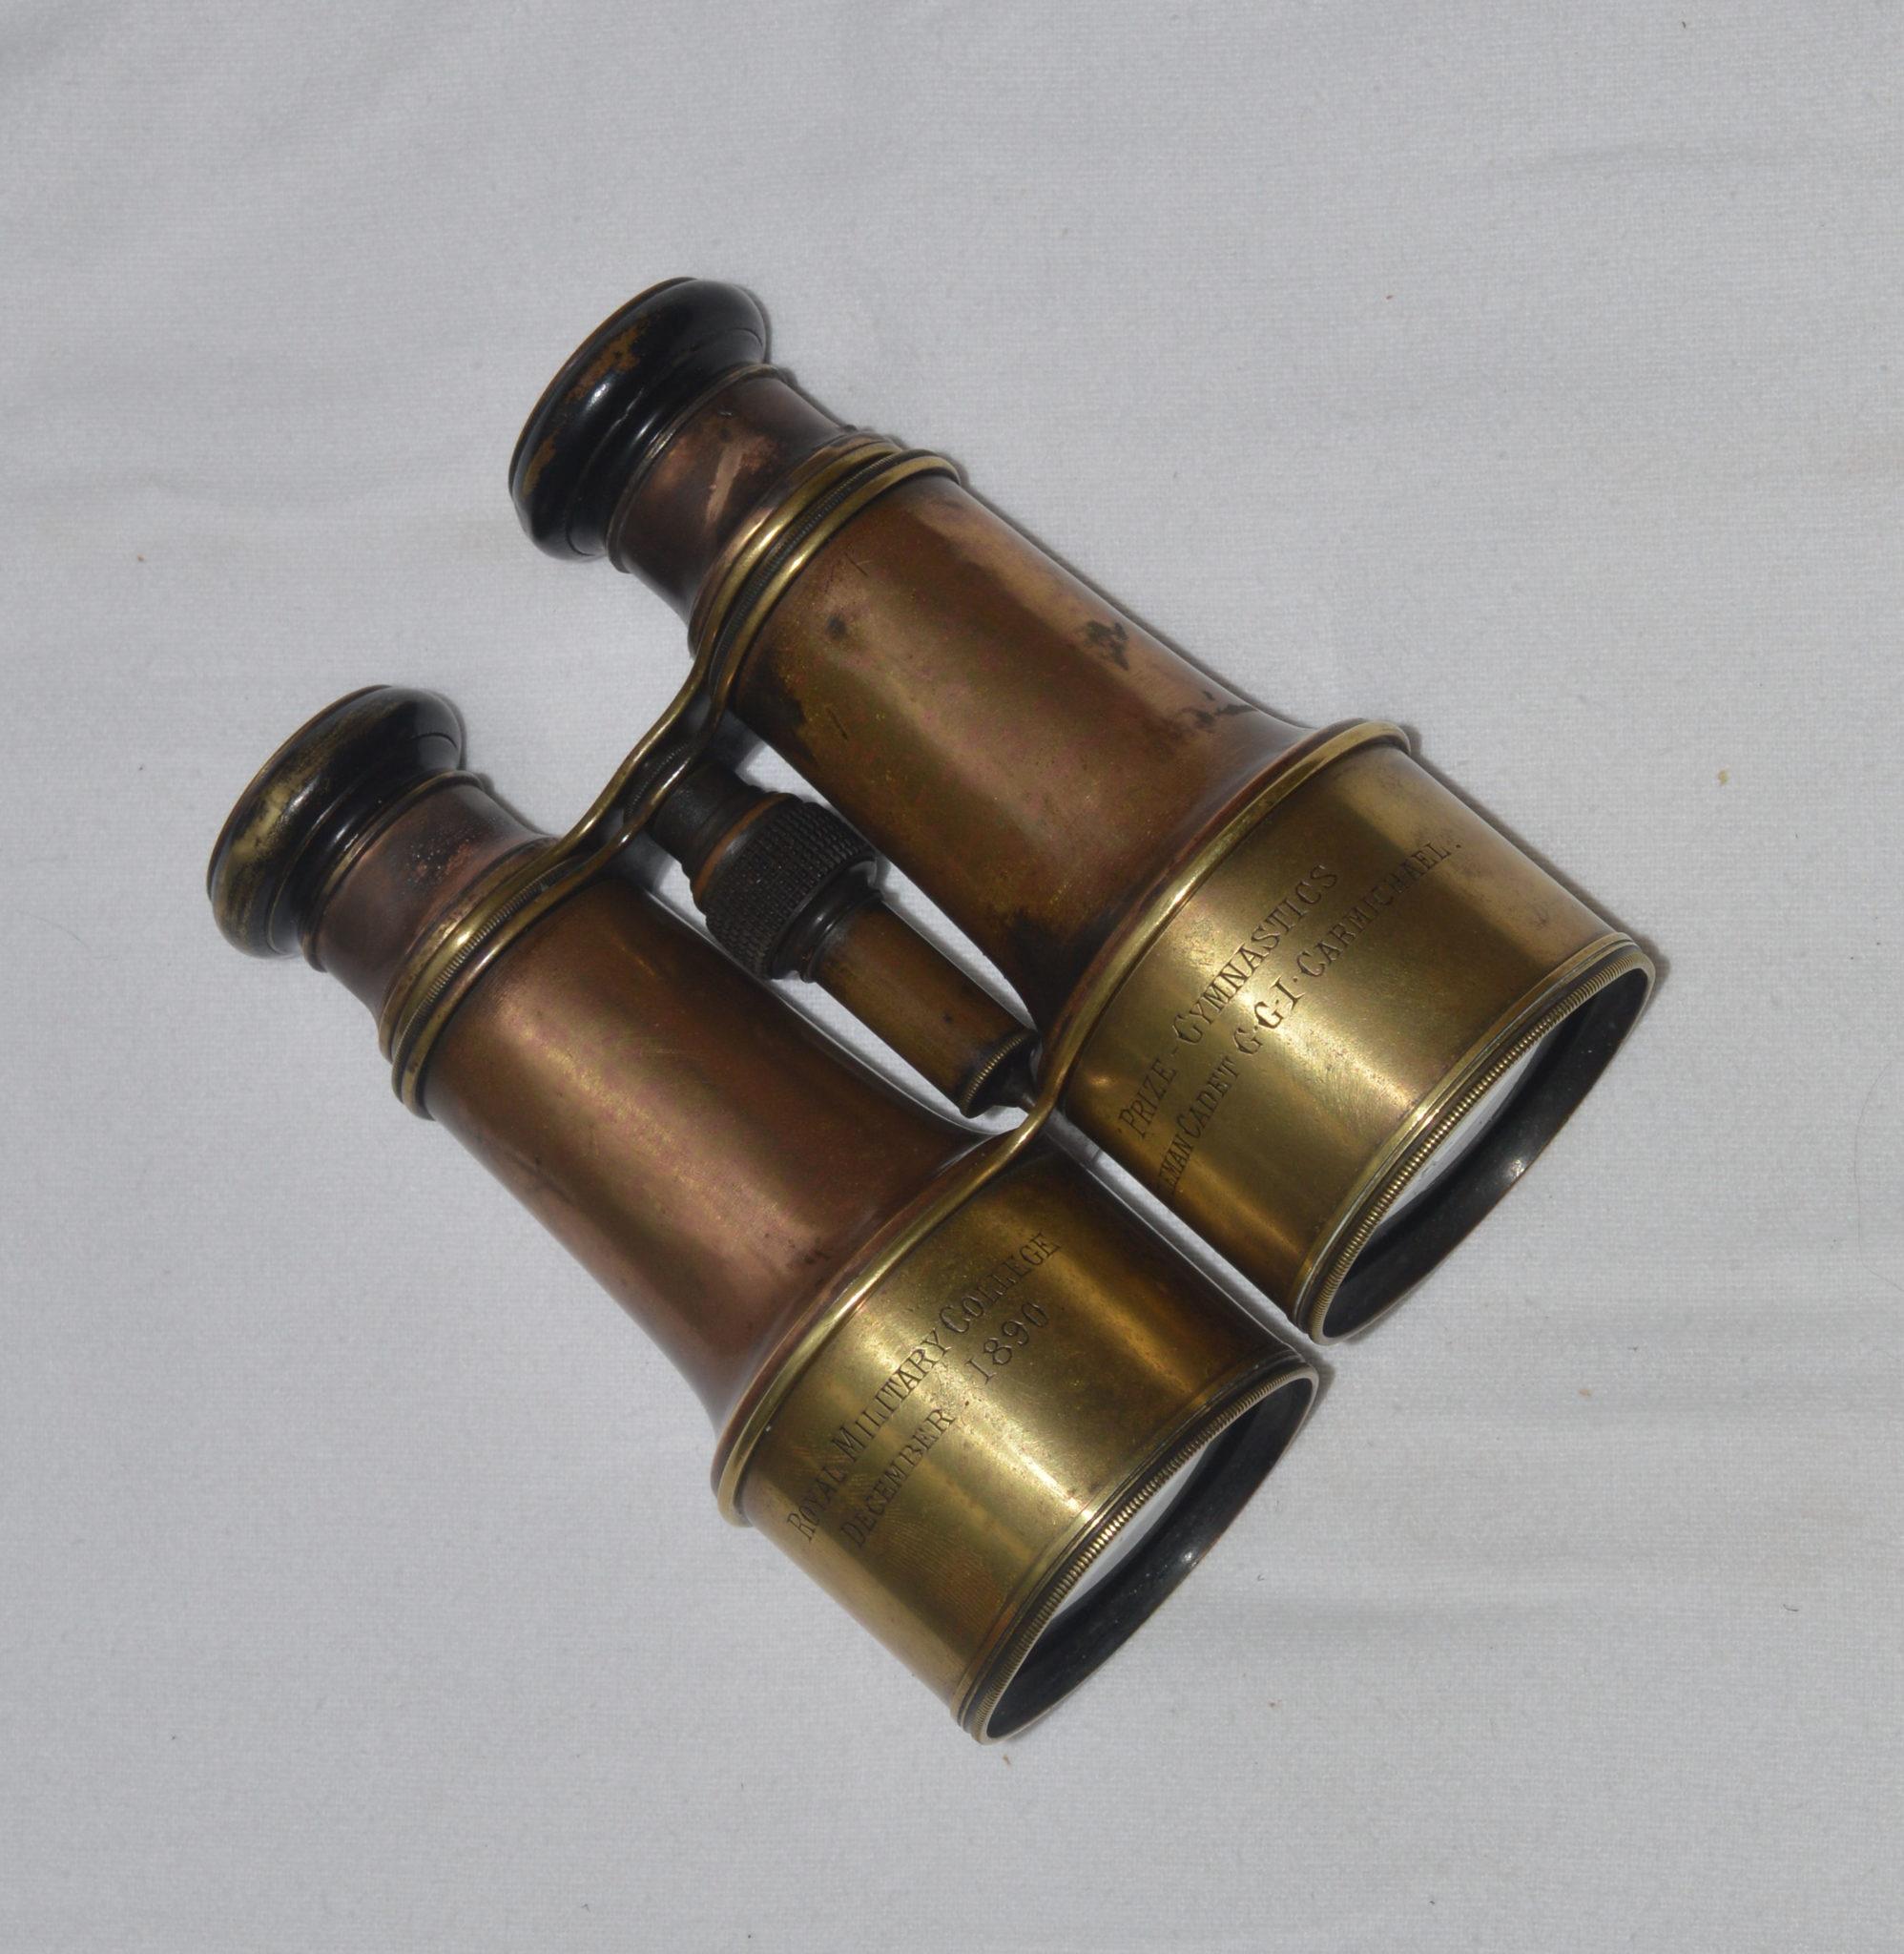 Presentation binoculars in case, Royal Military College